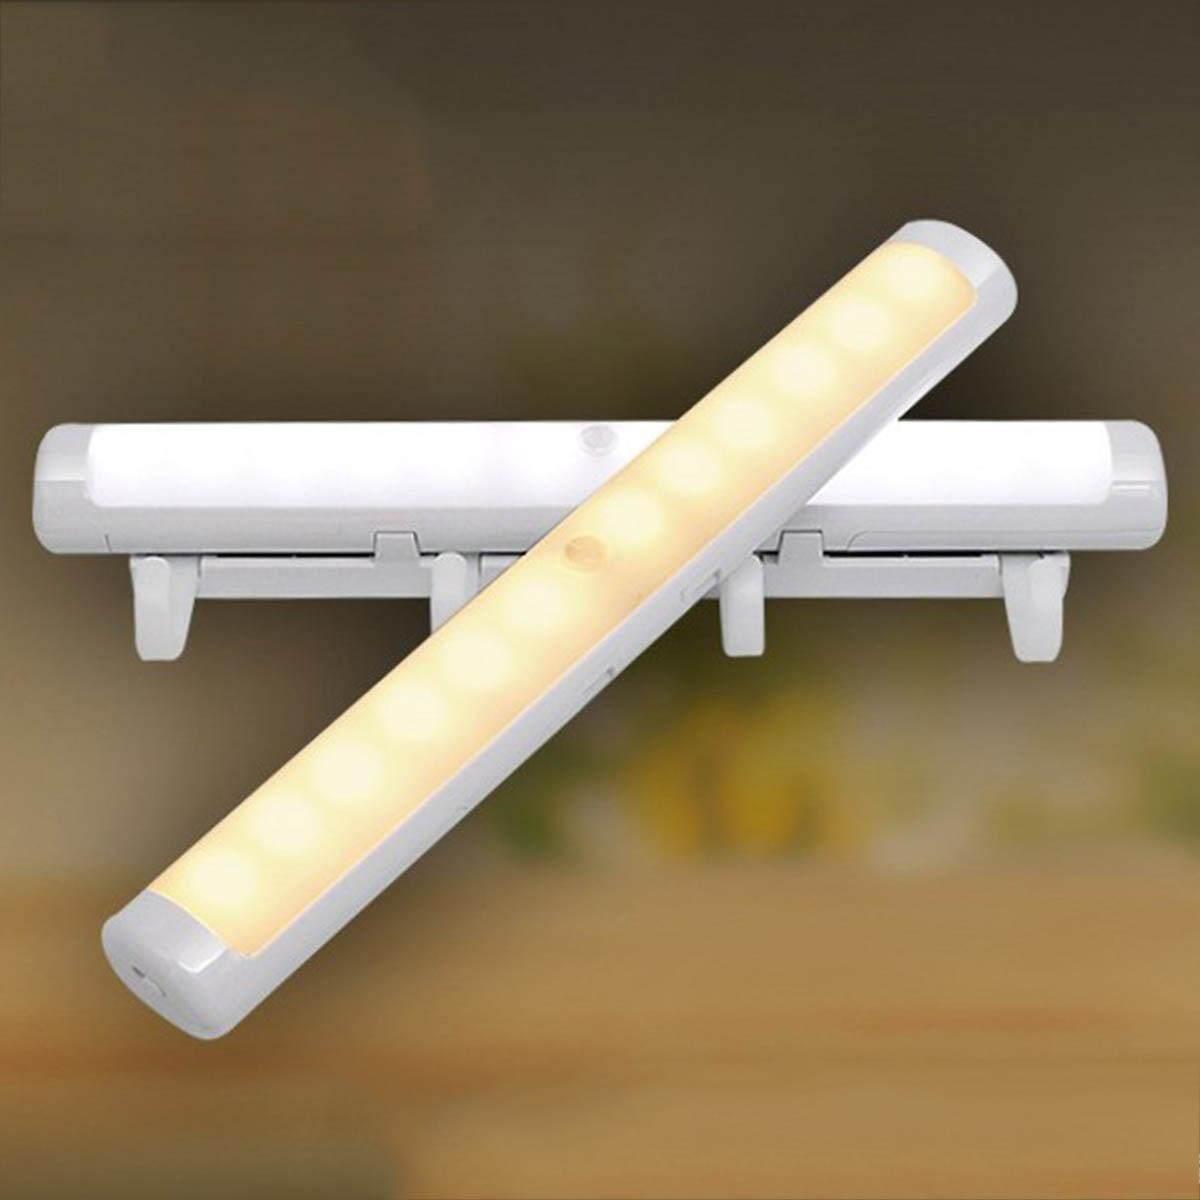 Motion Sensor Night Light Potable LED Closet Lights Wall Lamp Battery Powered Wireless Cabinet Leds Lamp - intl